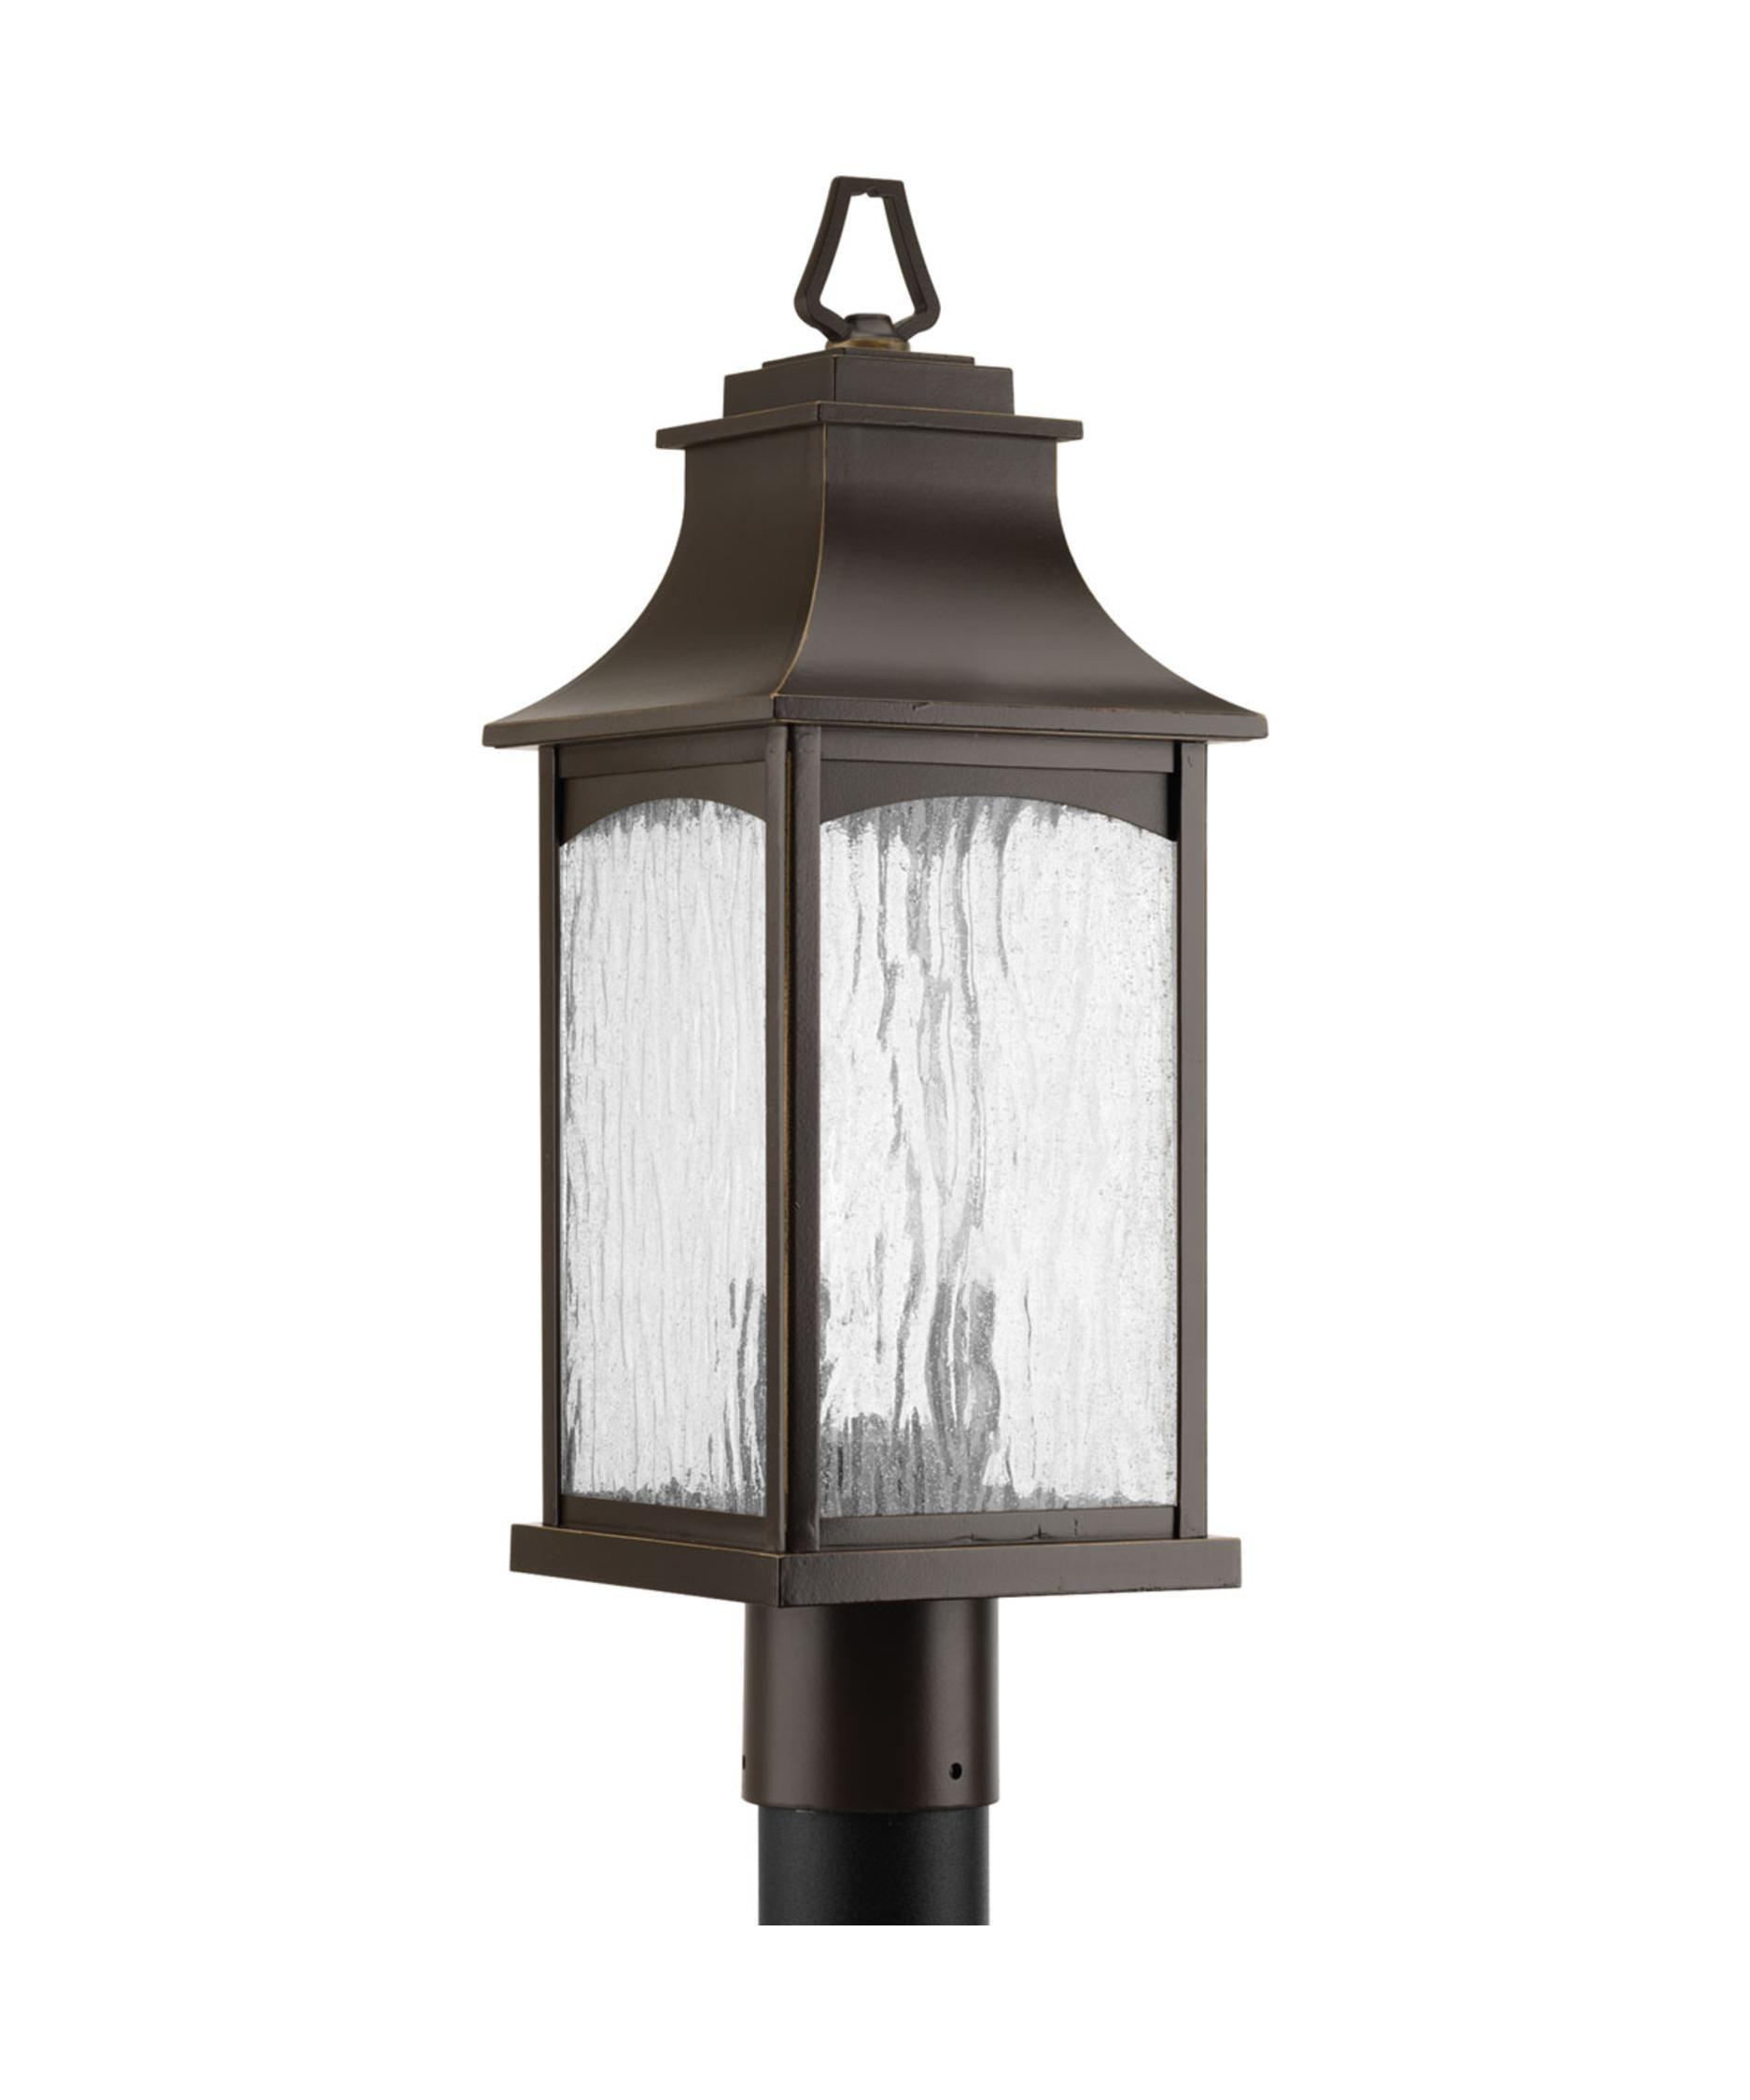 Maison 20 Inch Tall 2 Light Outdoor Post Lamp Capitol Lighting Outdoor Post Lights Post Lights Progress Lighting